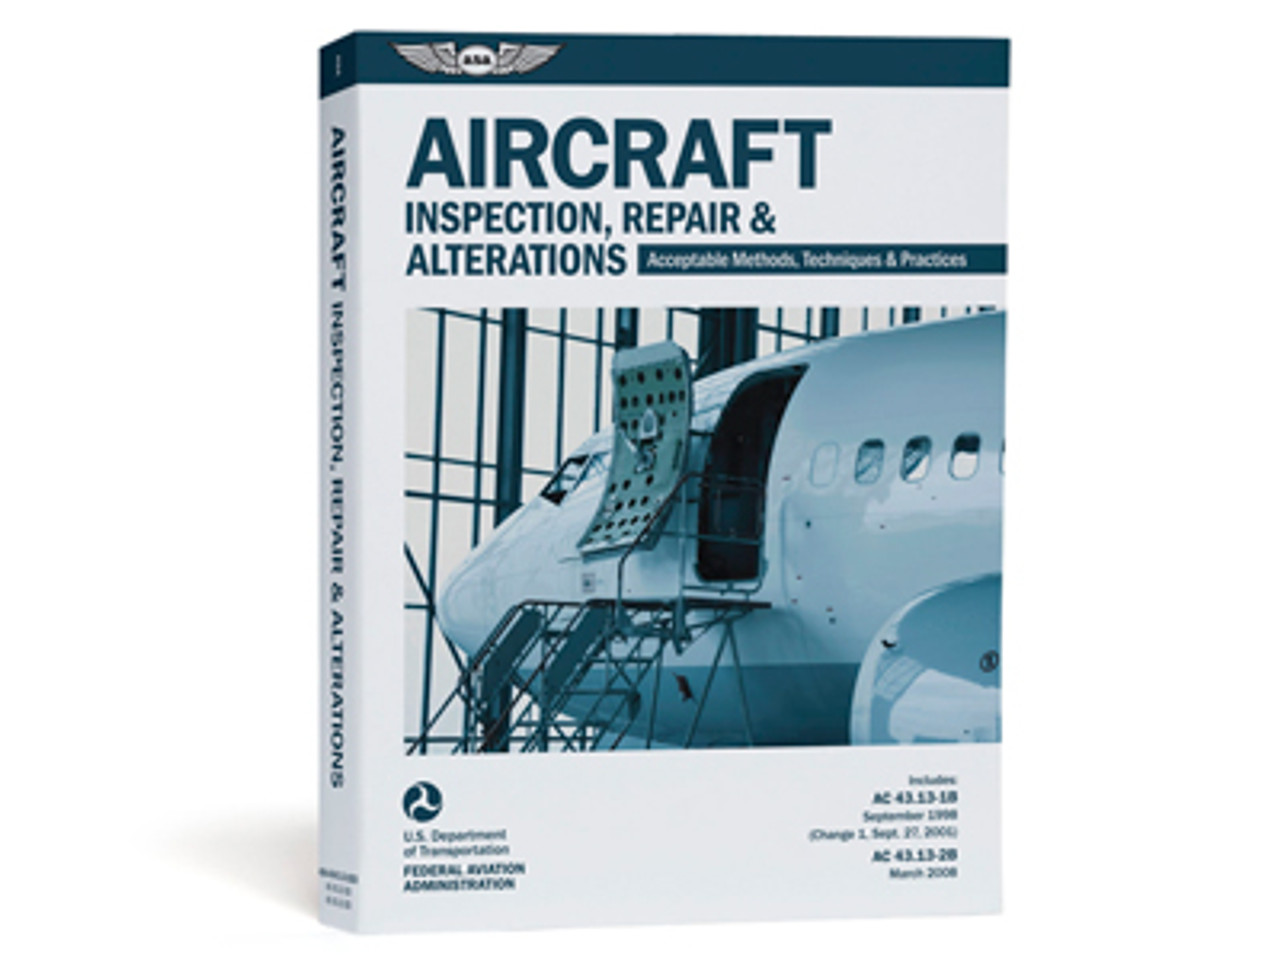 ASA Aircraft Inspection, Repair & Alterations